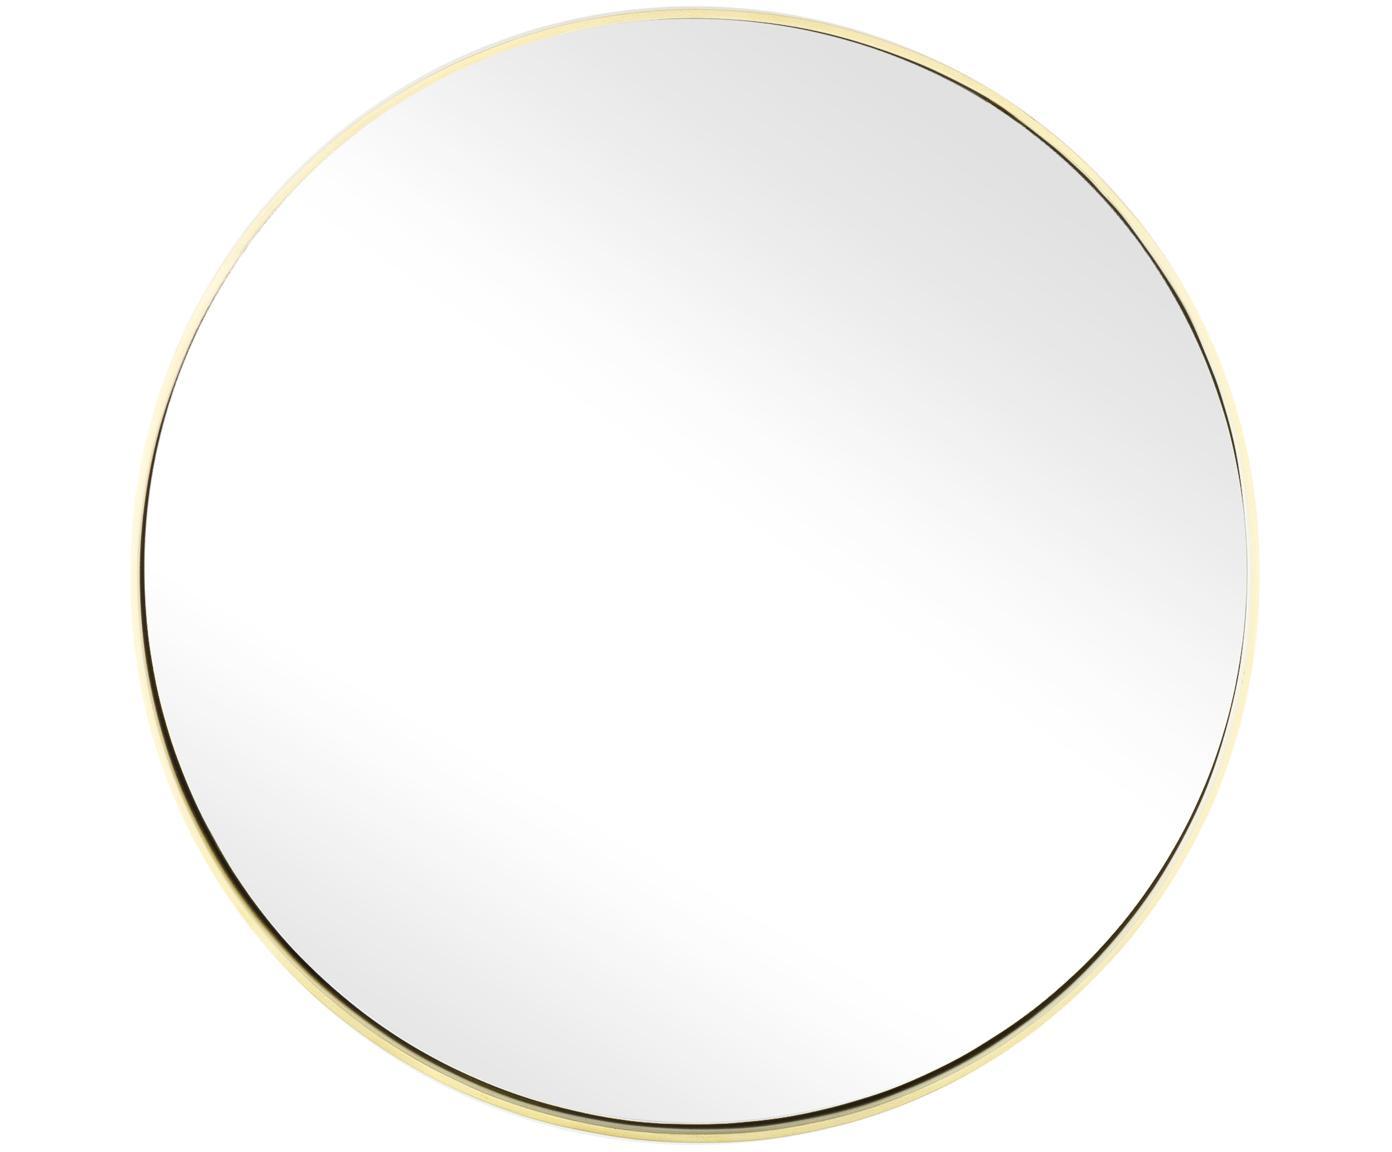 Espejo de pared redondo Ada, Espejo: cristal, Latón cepillado, Ø 40 cm